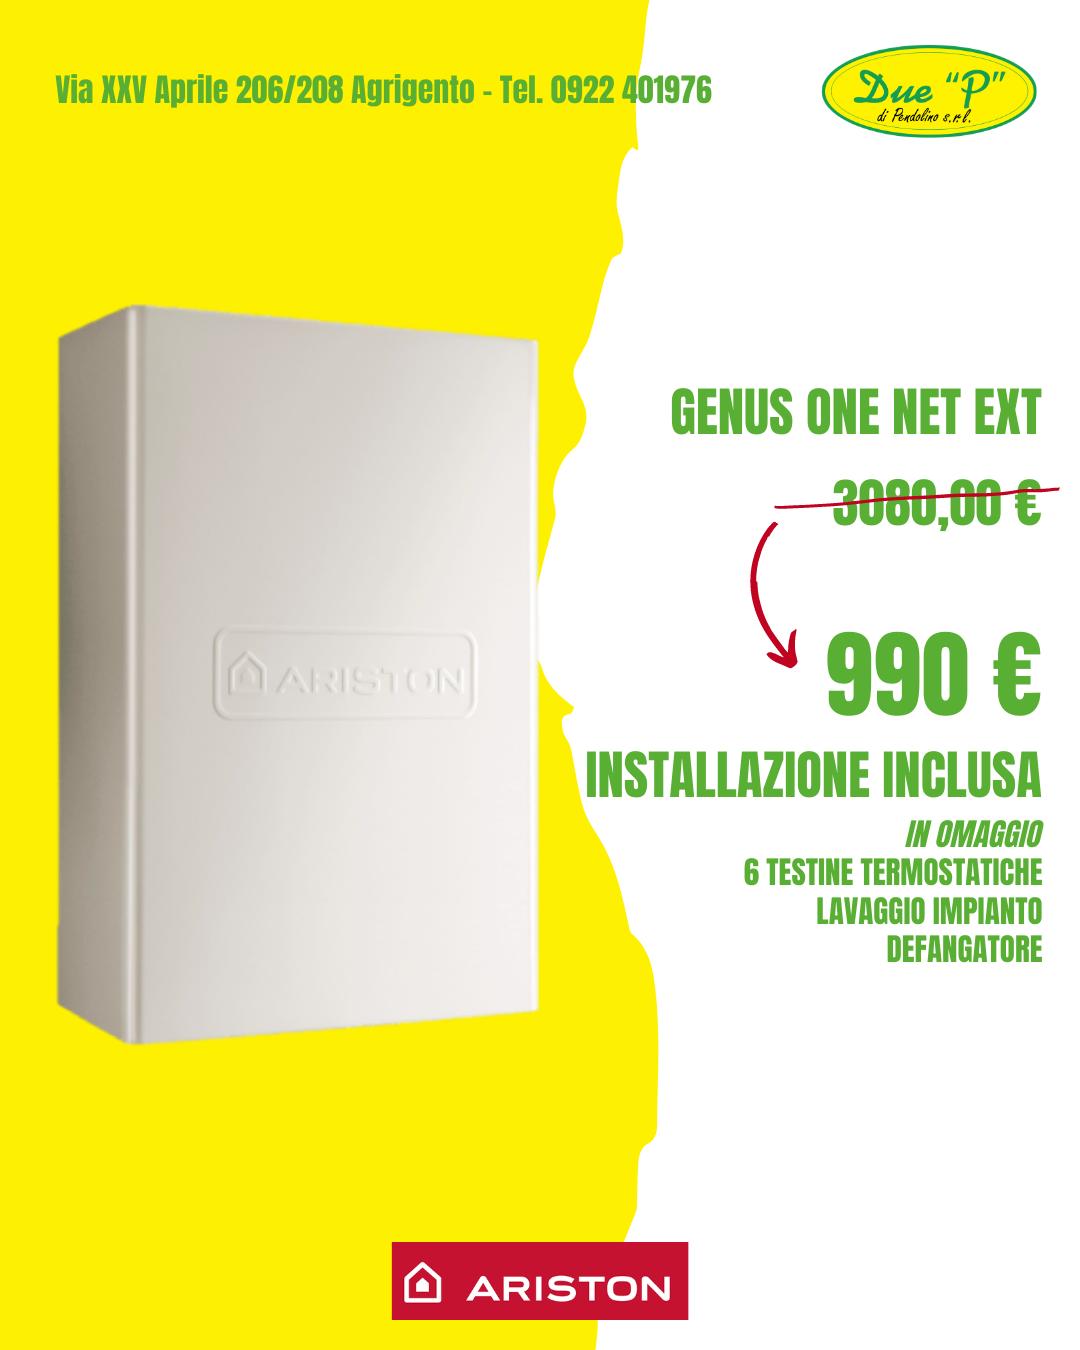 genus one net ext 65%